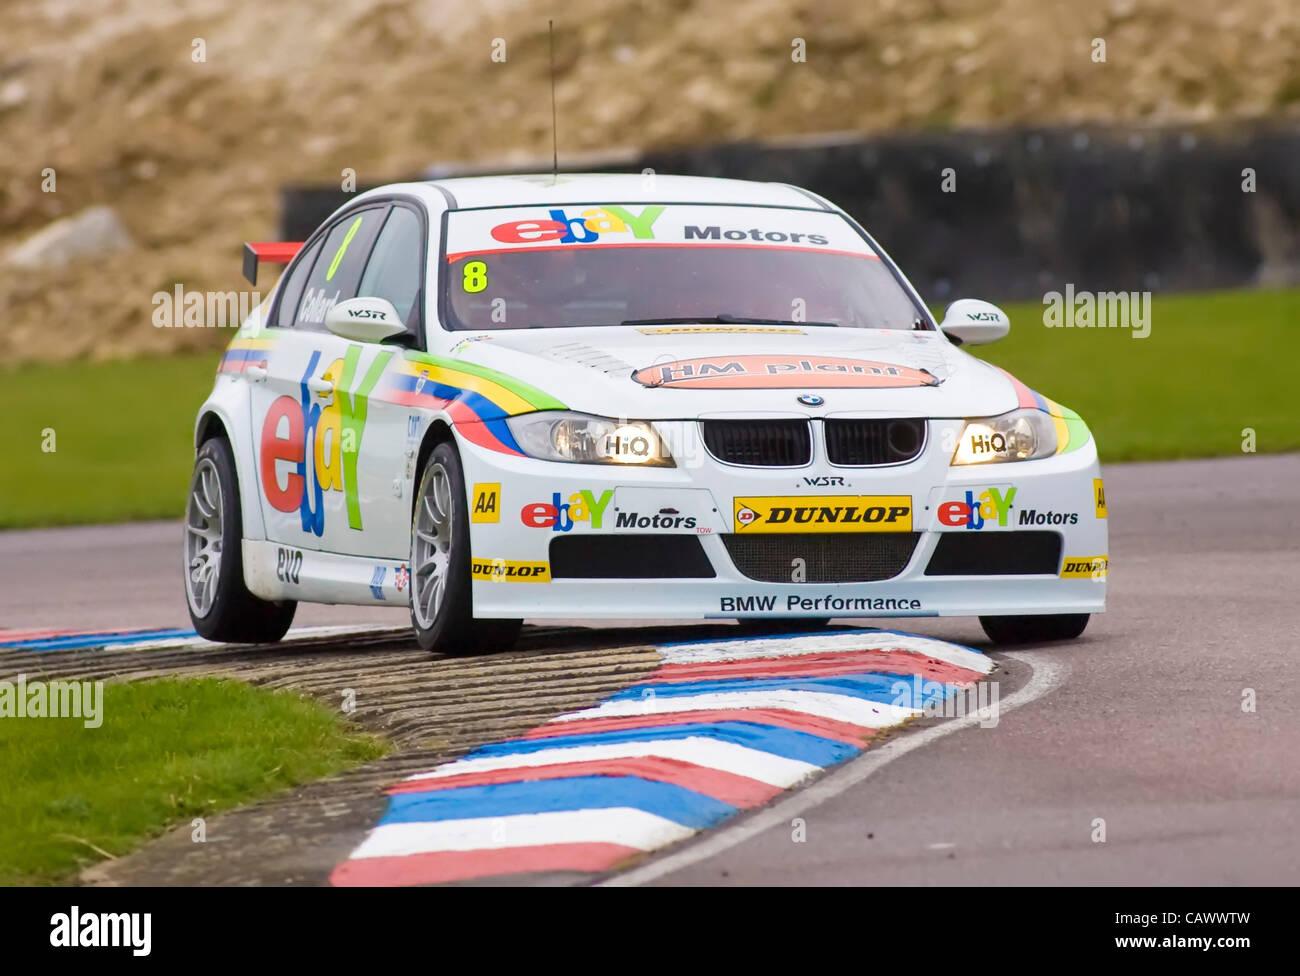 28 04 2012 Thruxton Robert Collard Driving The Ebay Motors Bmw 320i Stock Photo Alamy